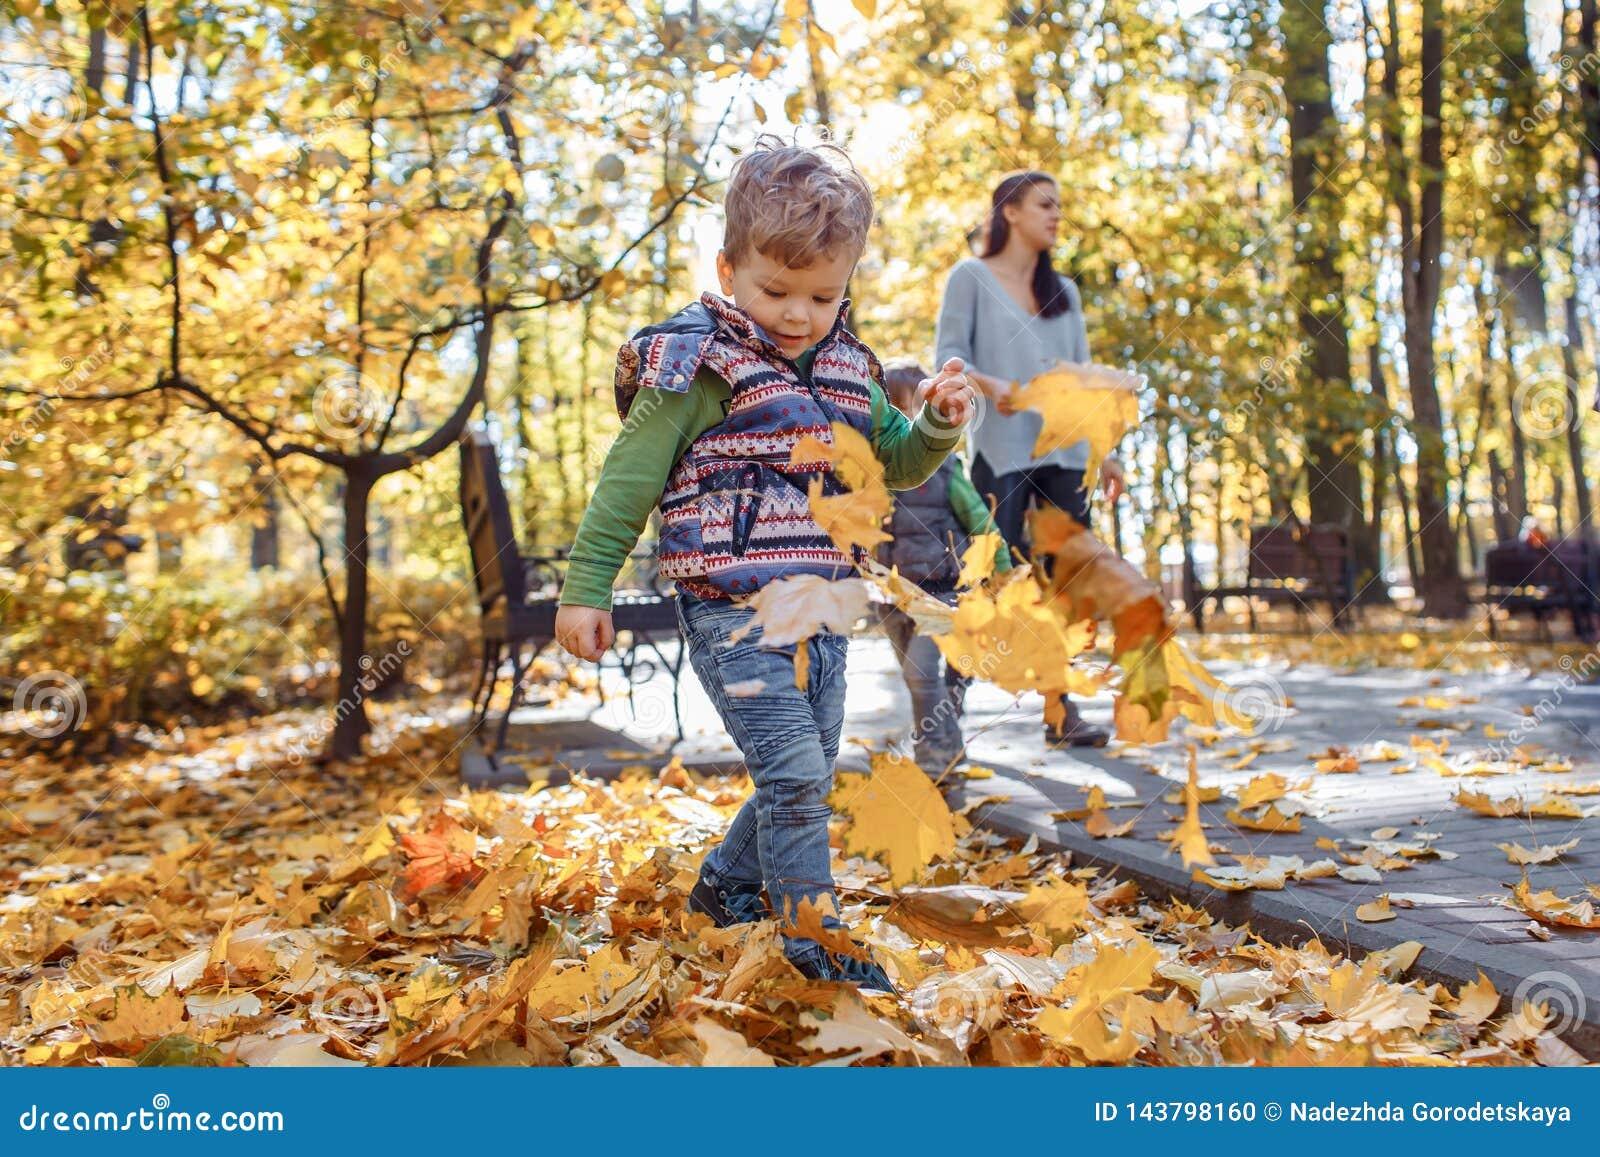 A cute little boy having fun in the park in autumn